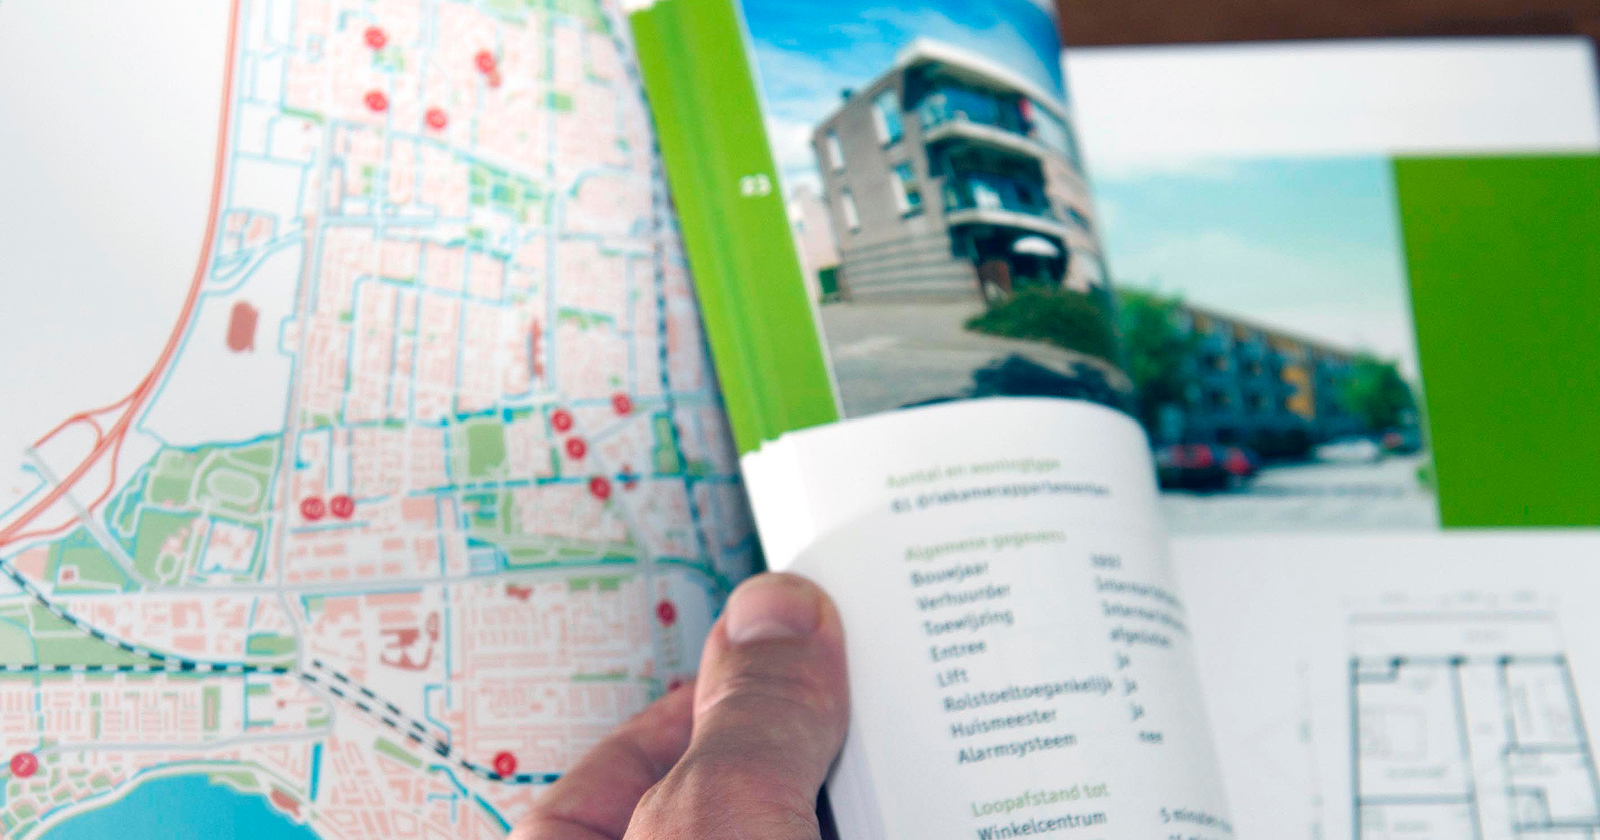 info-cartografics19-Woningcorporatie